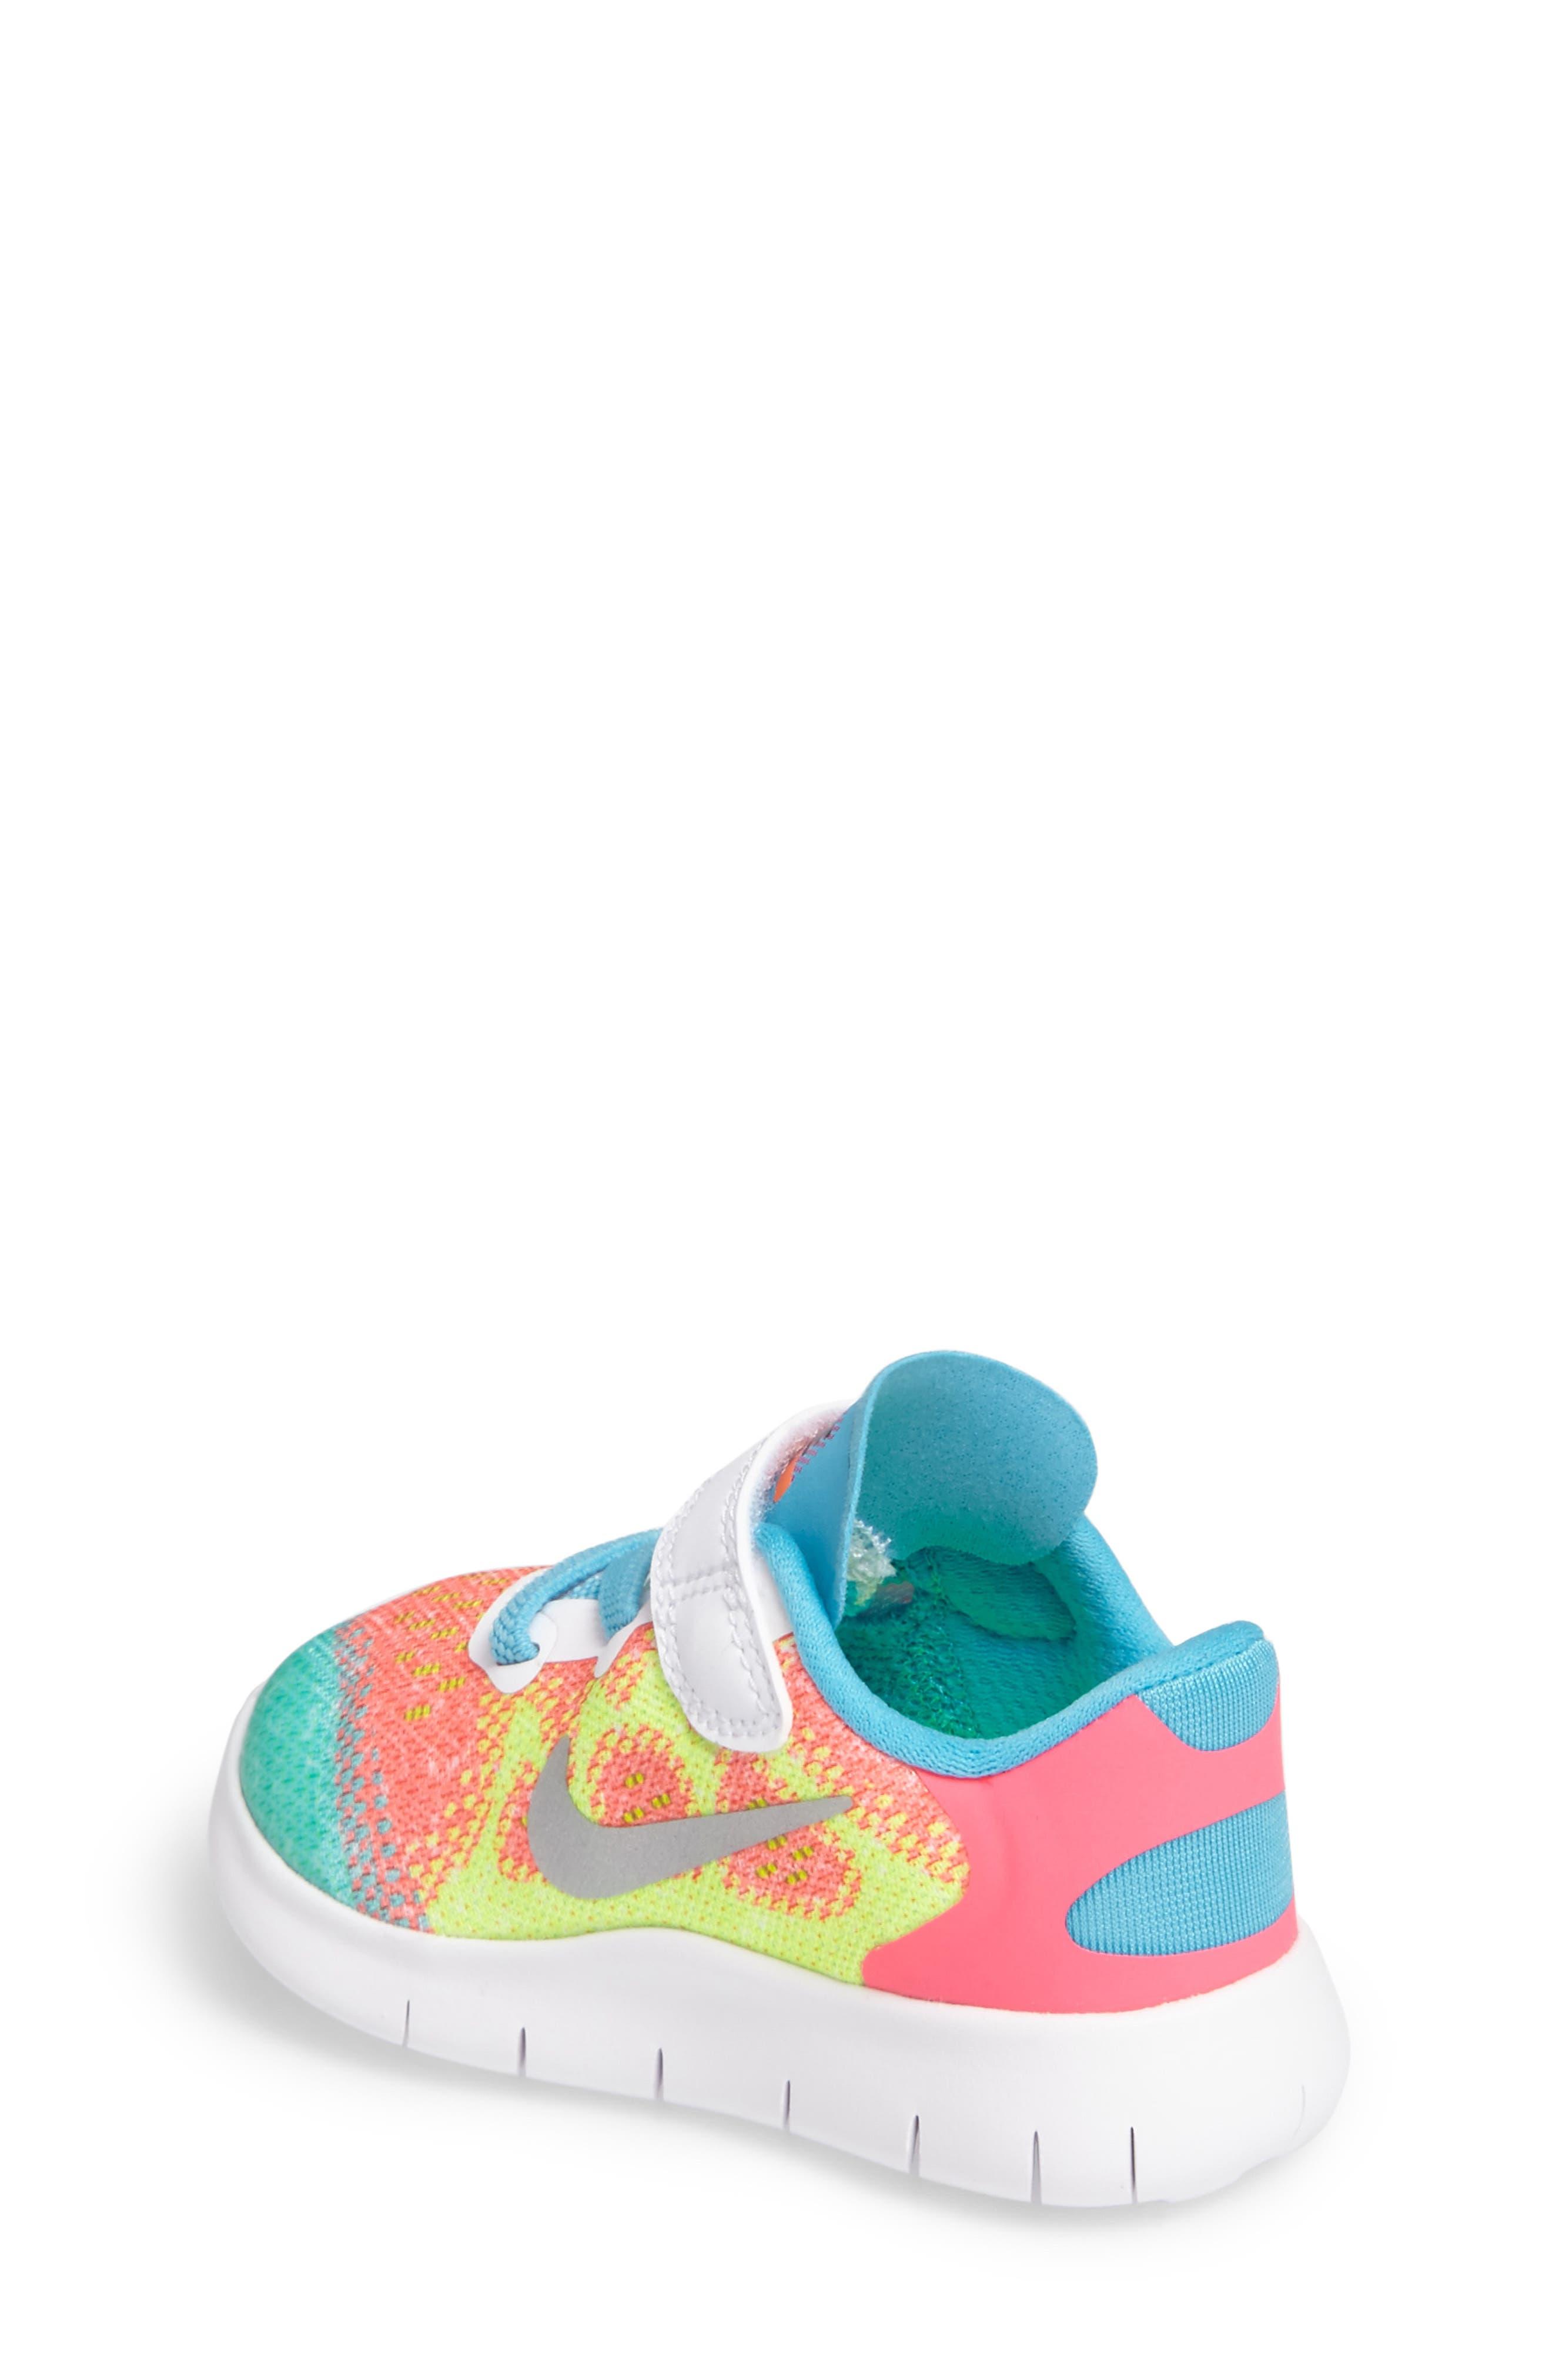 Free Run 2017 Sneaker,                             Alternate thumbnail 7, color,